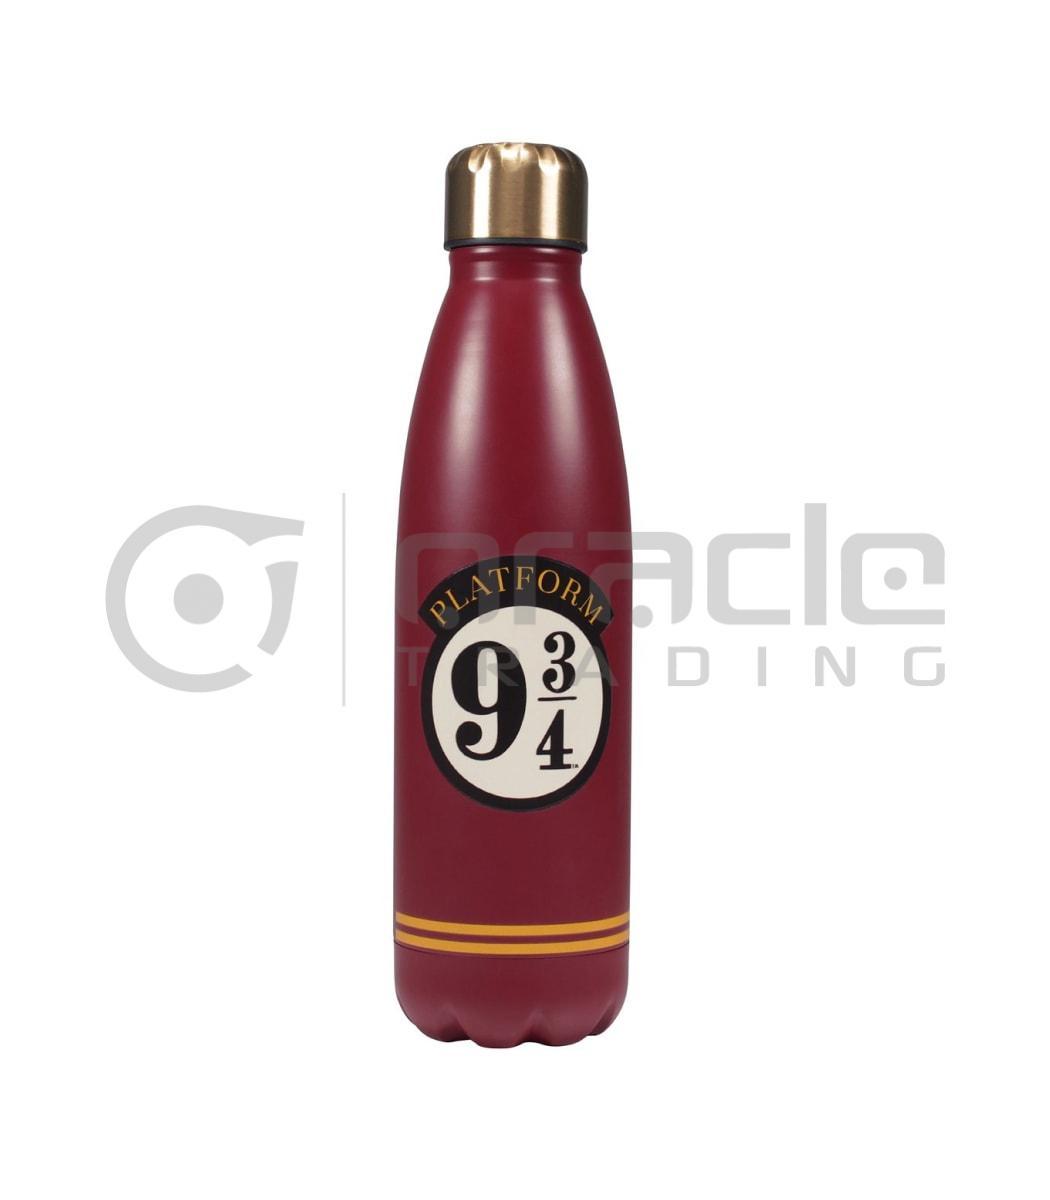 Harry Potter Insulated Water Bottle - Hogwarts Express